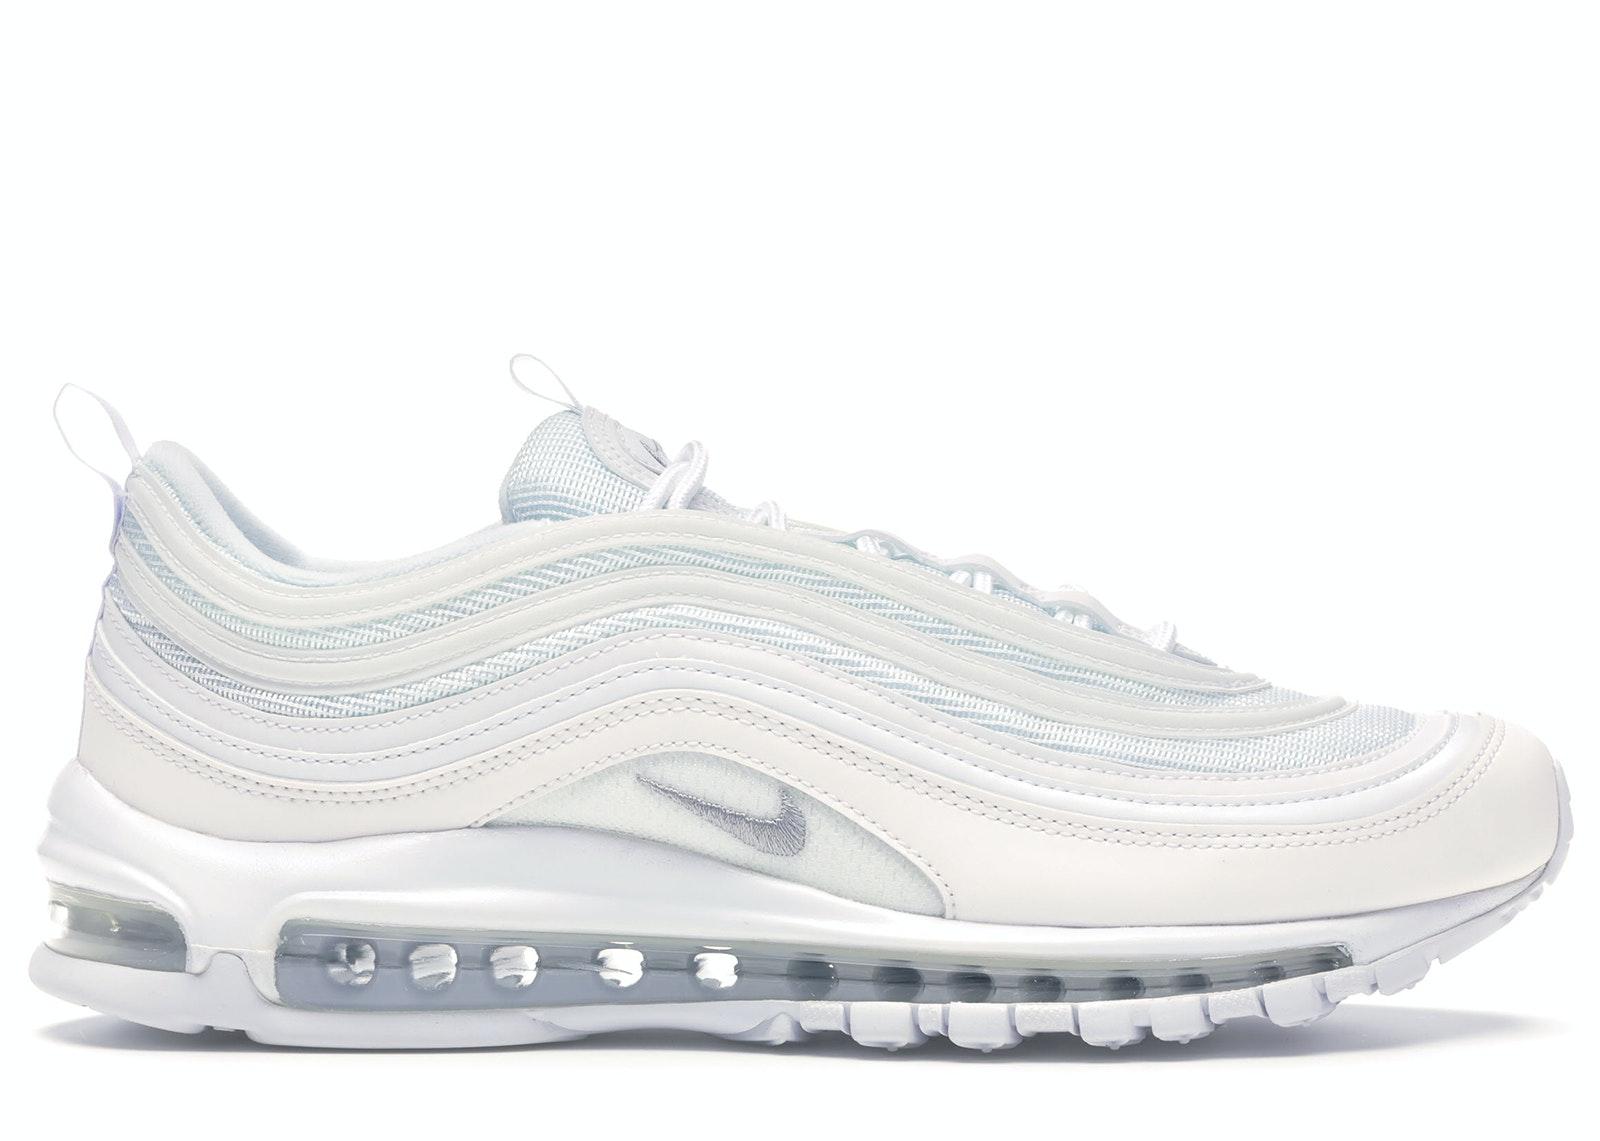 nike air max grey and white